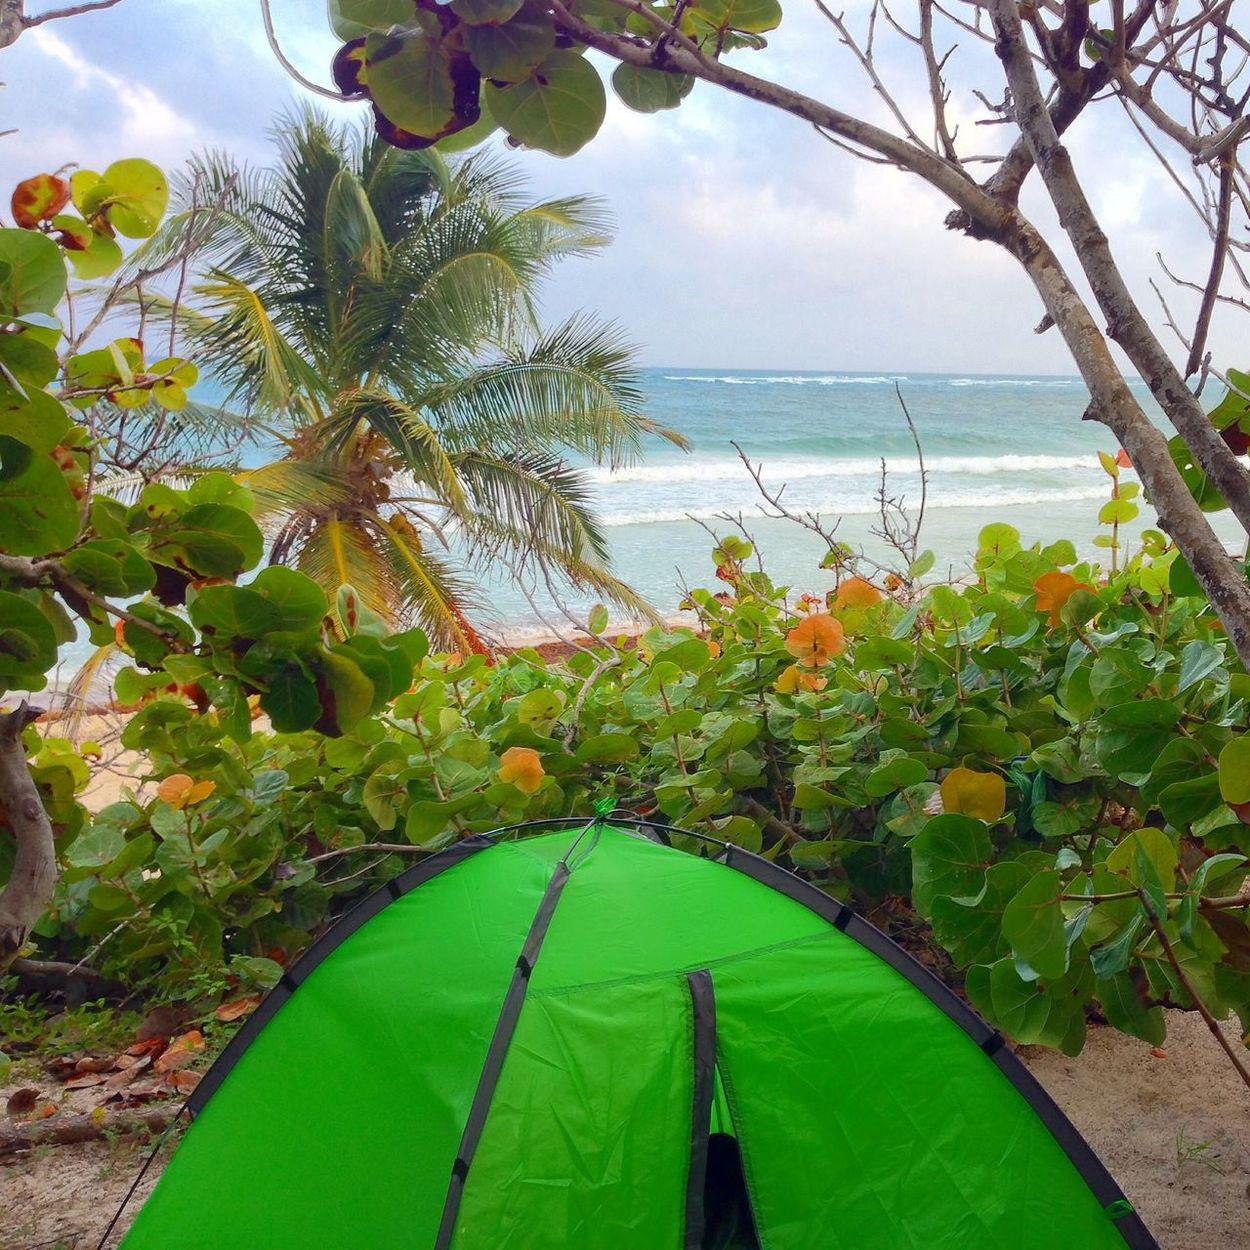 Camping Enjoying Life Caribbean Sea